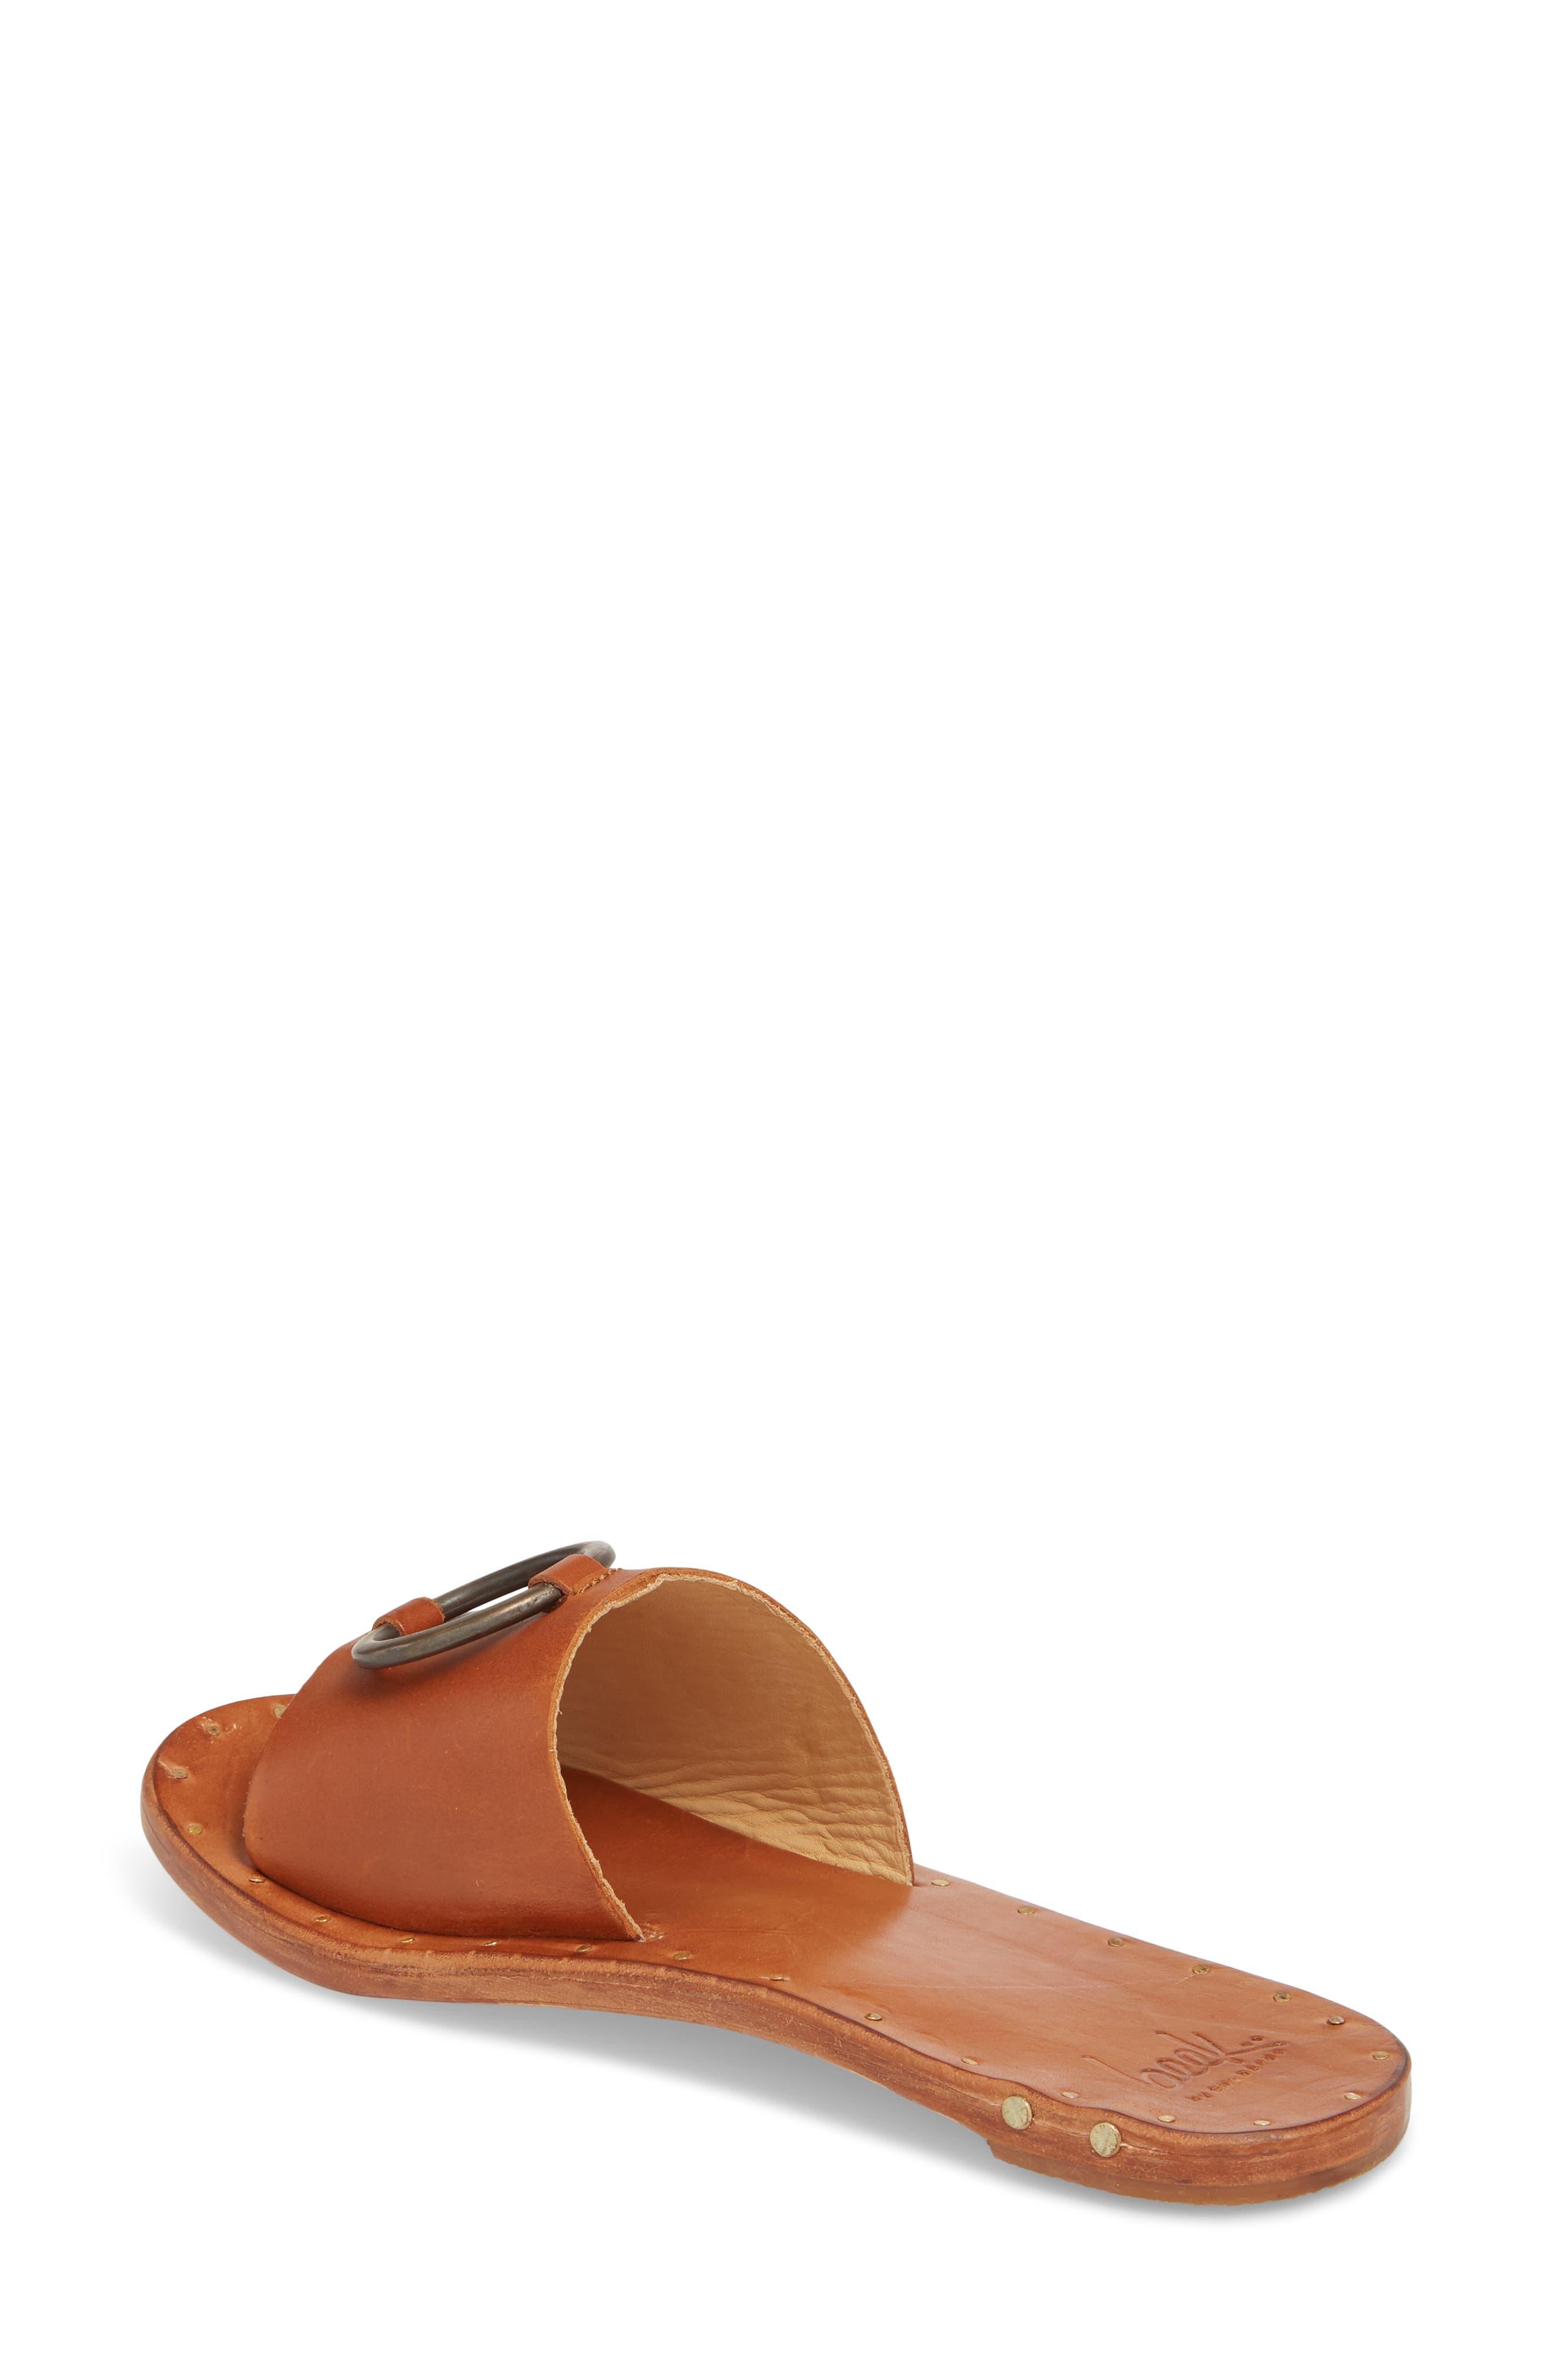 Cockatoo Slide Sandal,                             Alternate thumbnail 2, color,                             Tan/ Tan